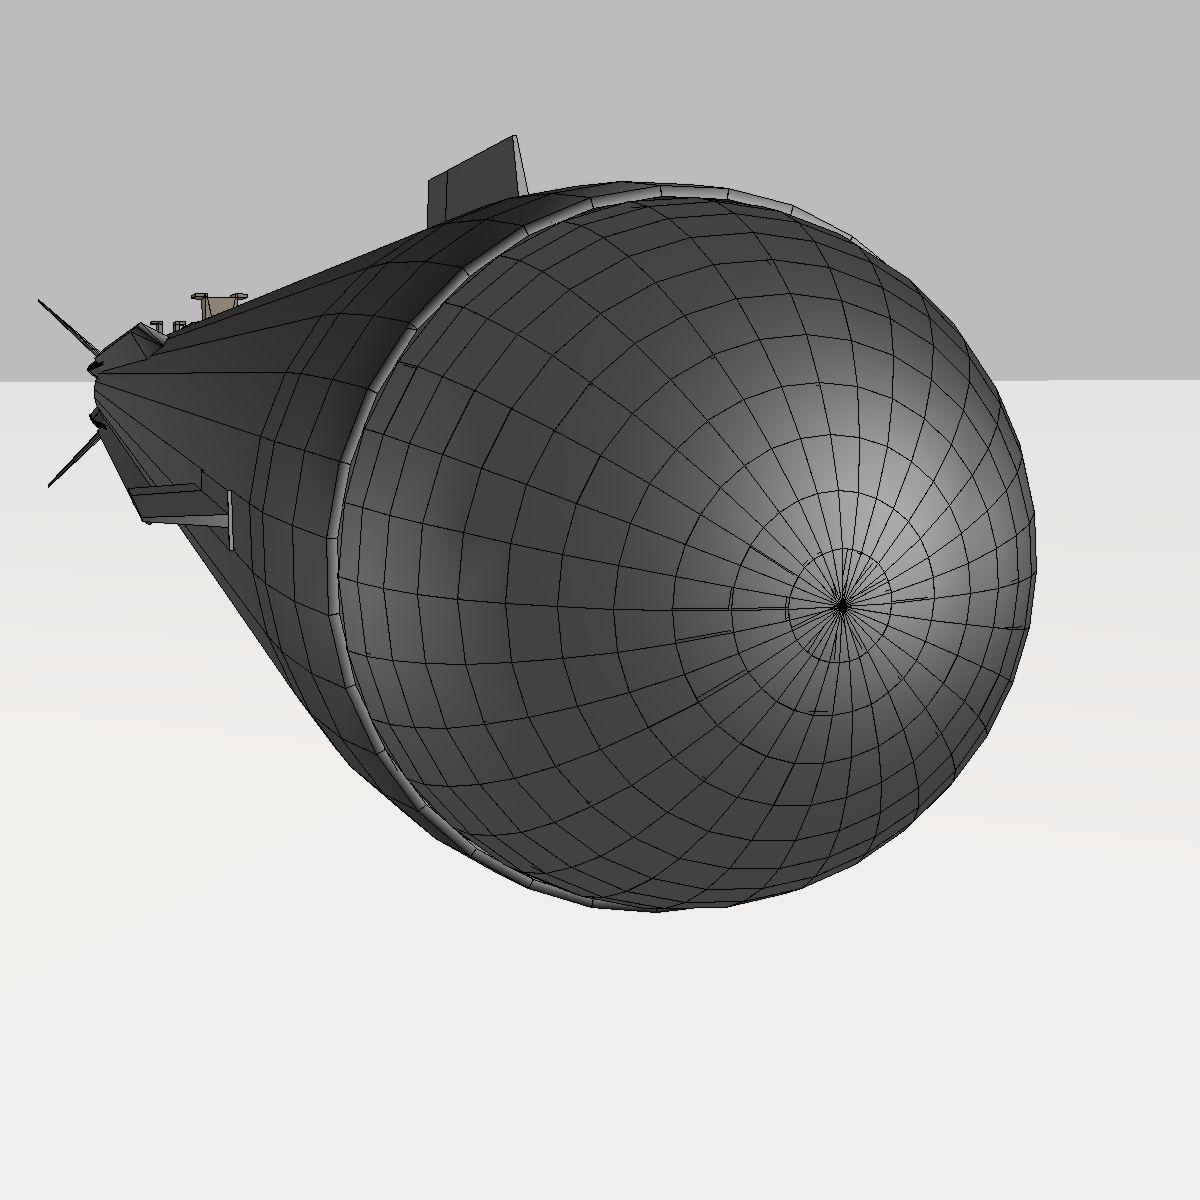 a-darter air-to-air пуужин 3d загвар 3ds dxf cob x obj 151892